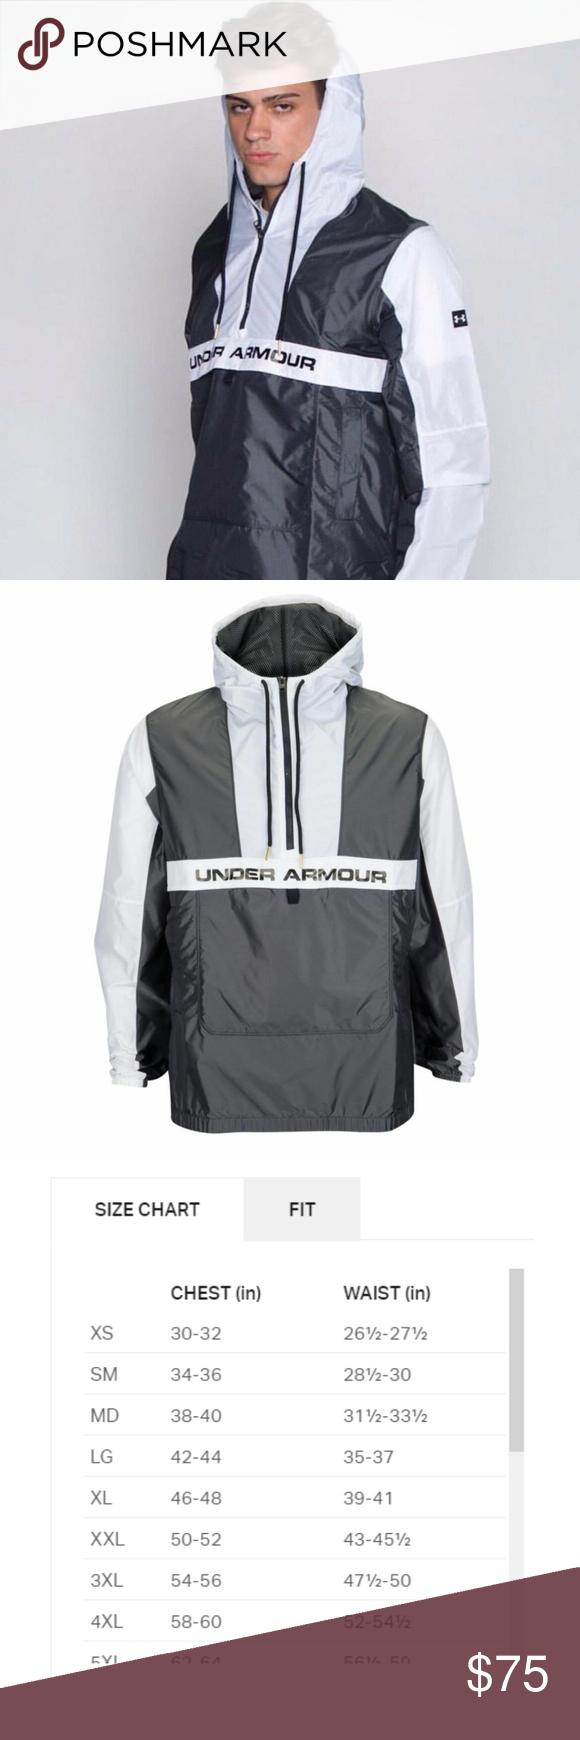 a8db1cca6e Under Armour Windbreaker Basketball Jacket Under Armour Mens UA ...